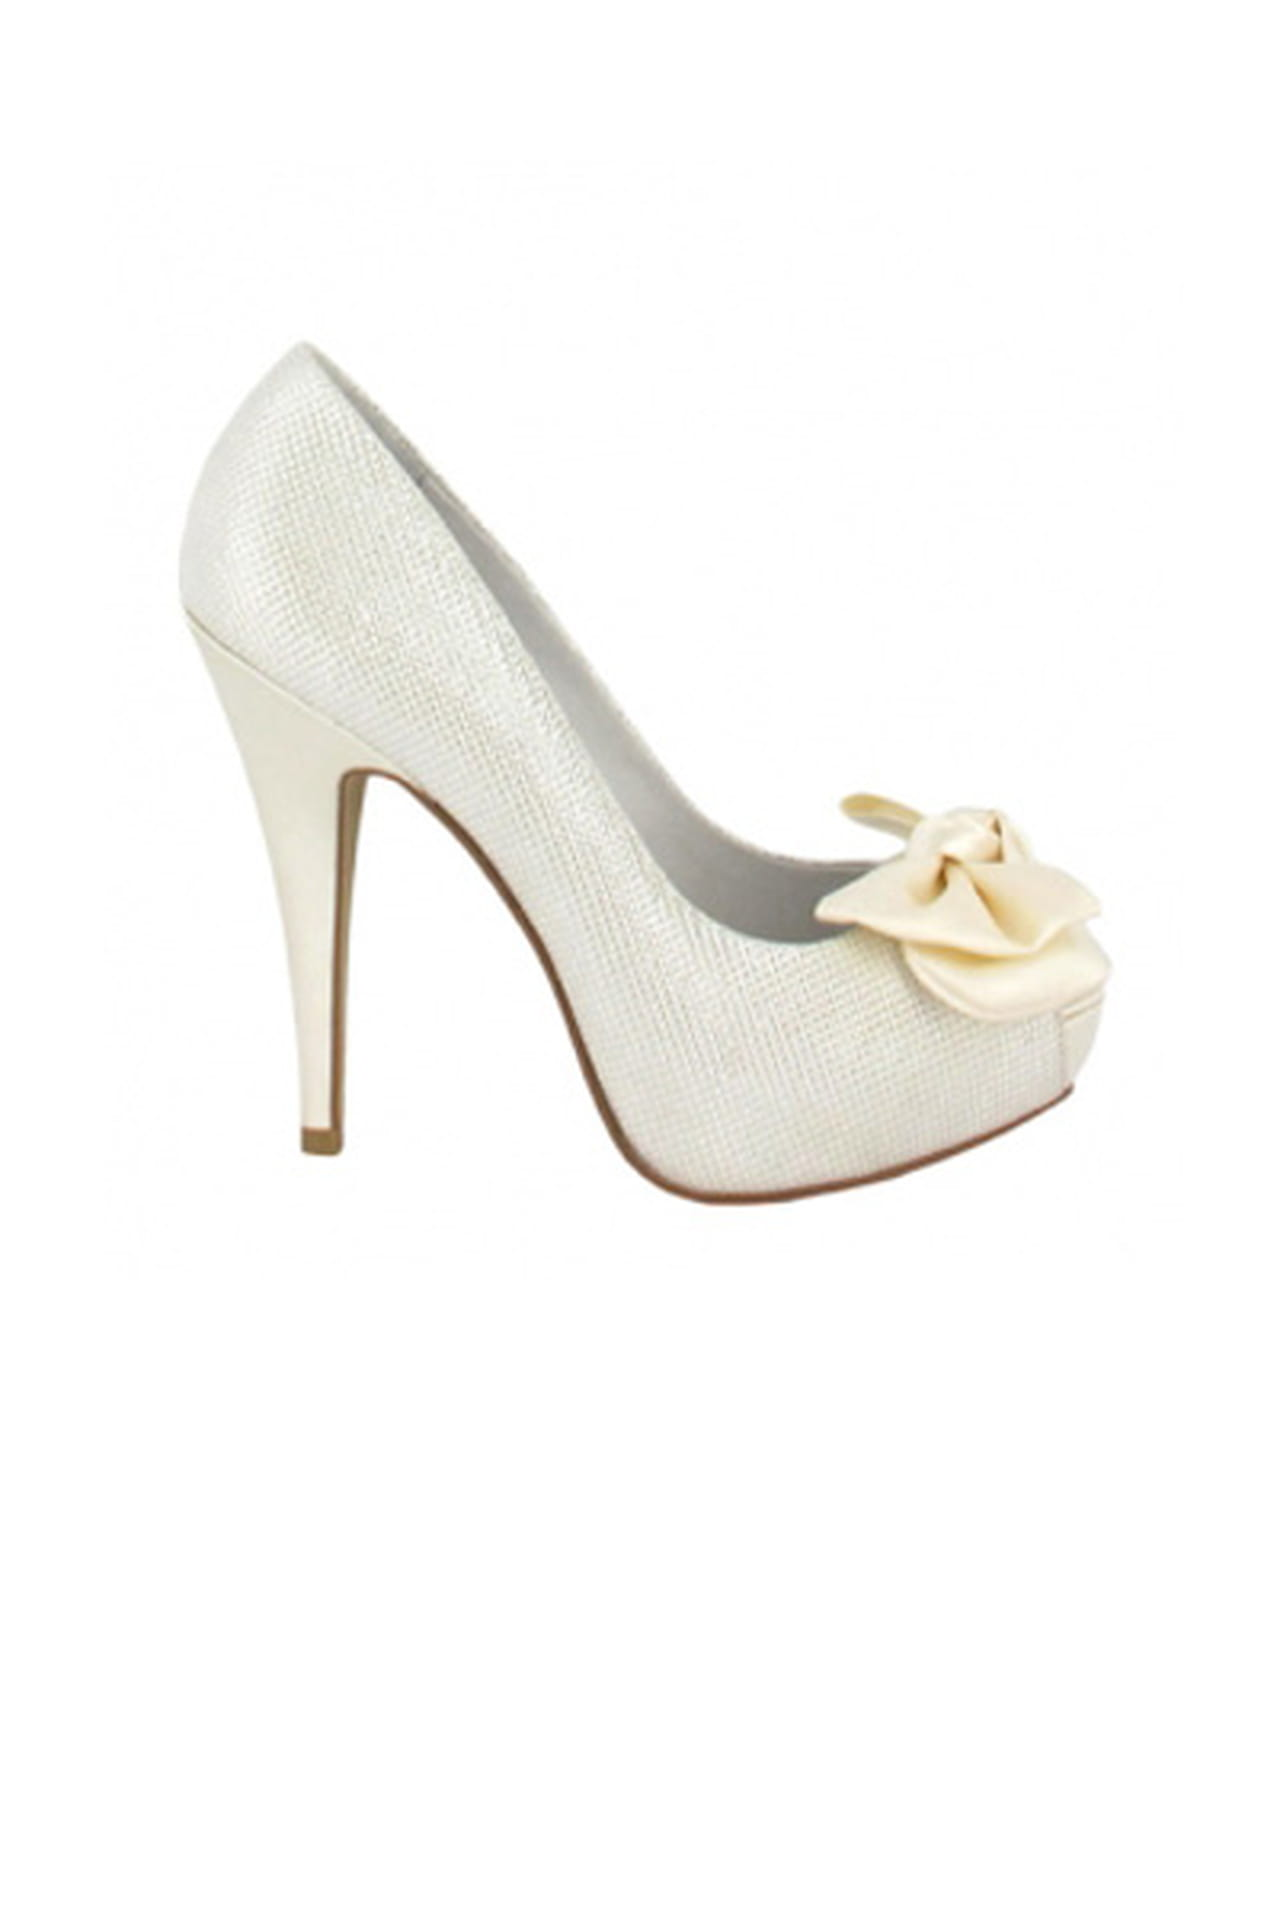 00791f462 احذية العروس من الماركة الإسبانية Menbur